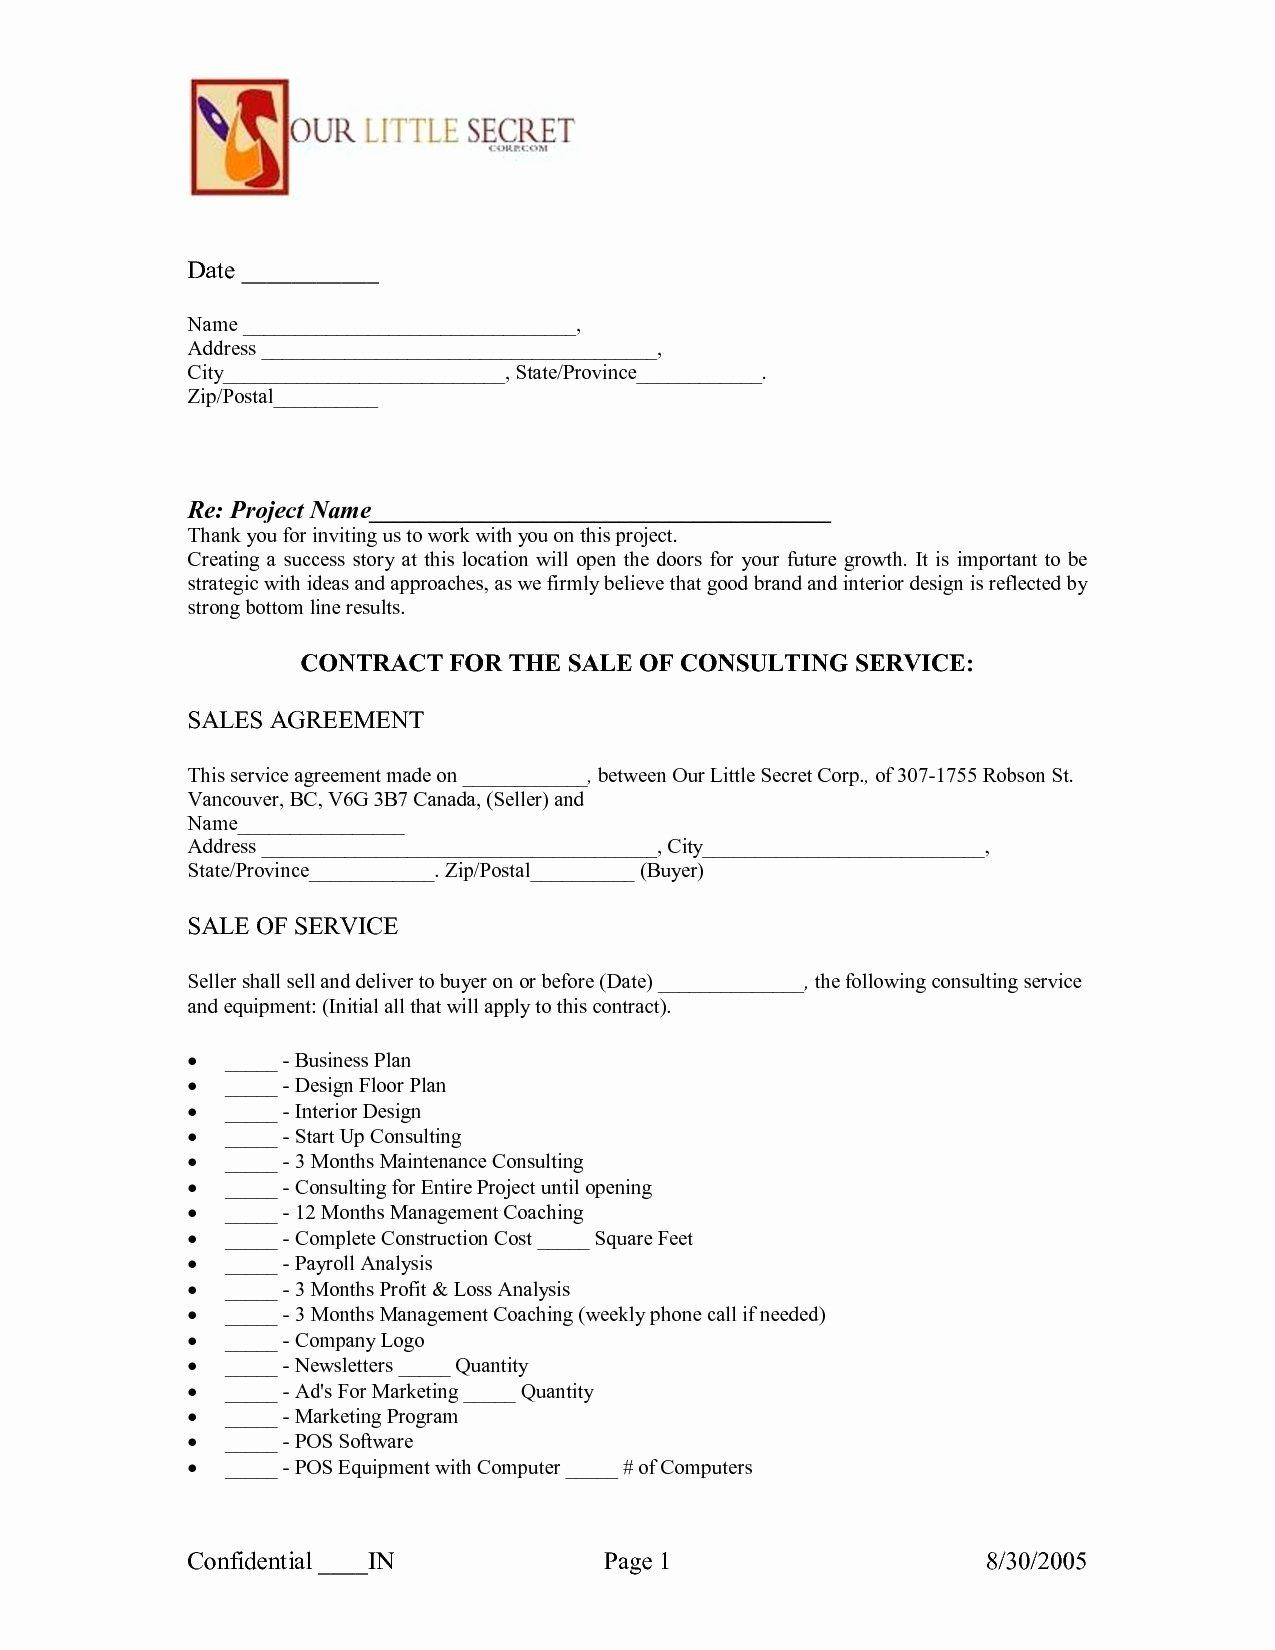 Interior Design Letter Of Agreement New Interior Design Contract Template